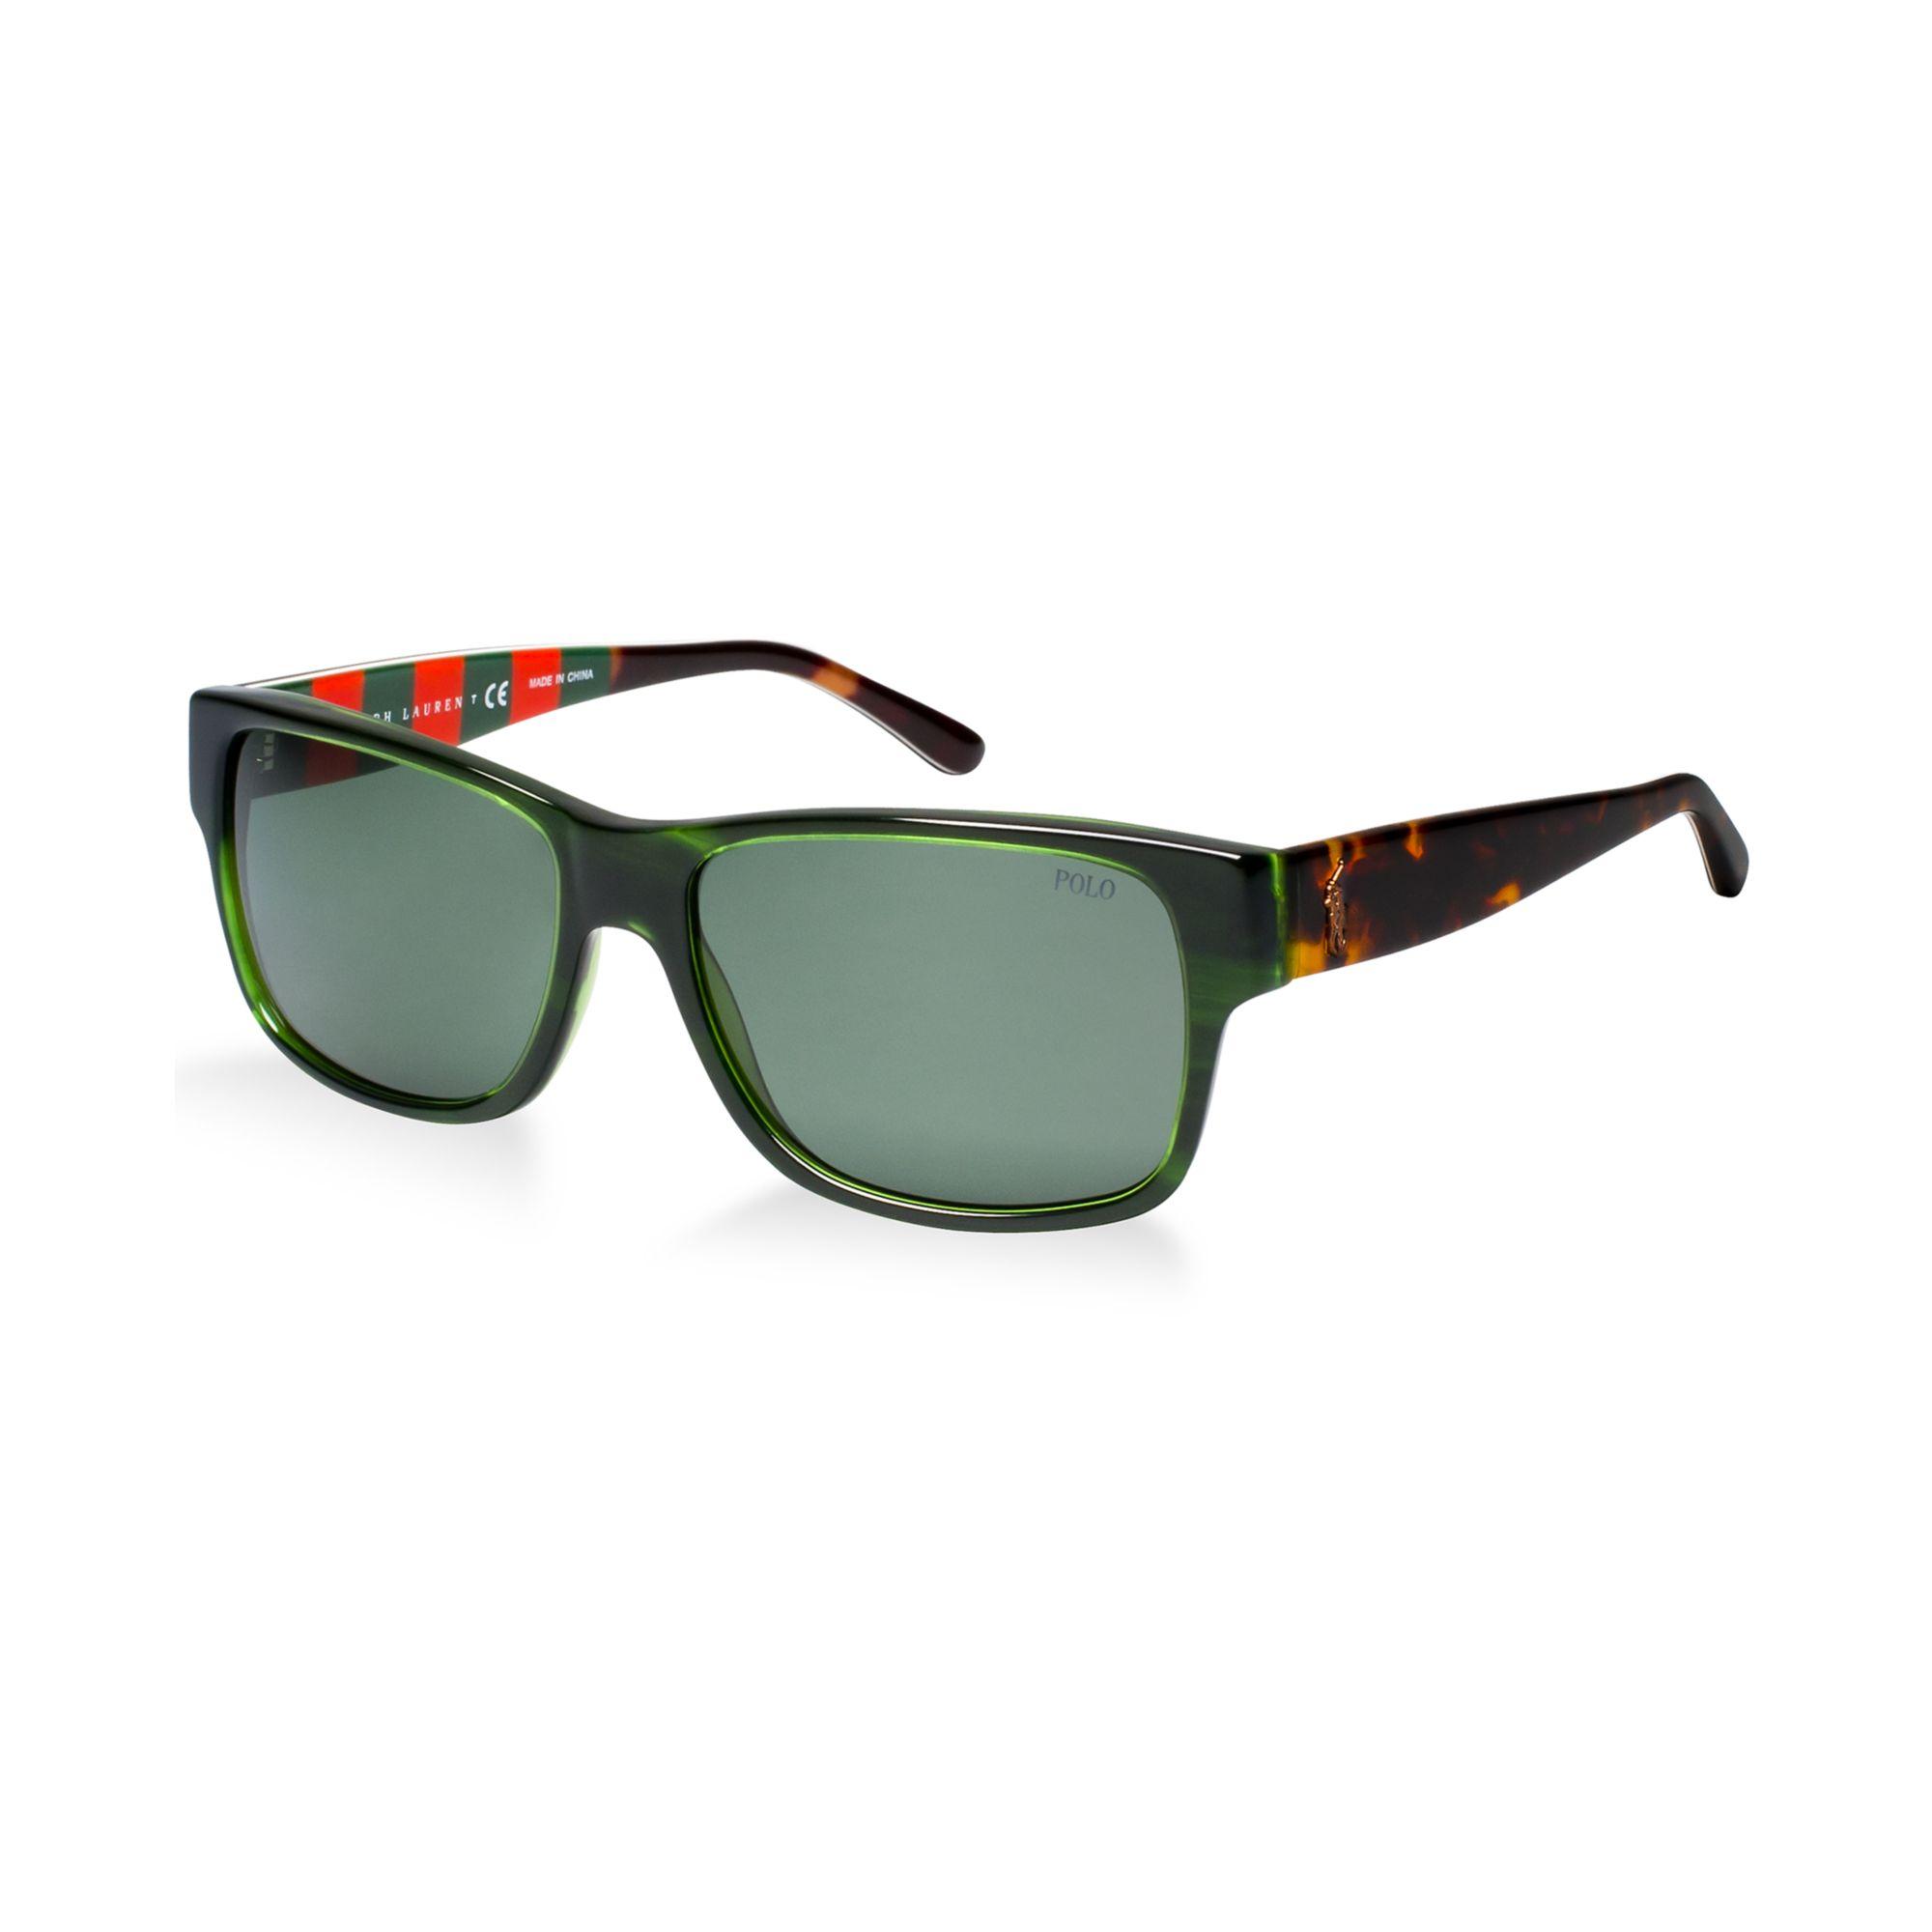 Polo Ralph Lauren Sunglasses Aviators | City of Kenmore, Washington